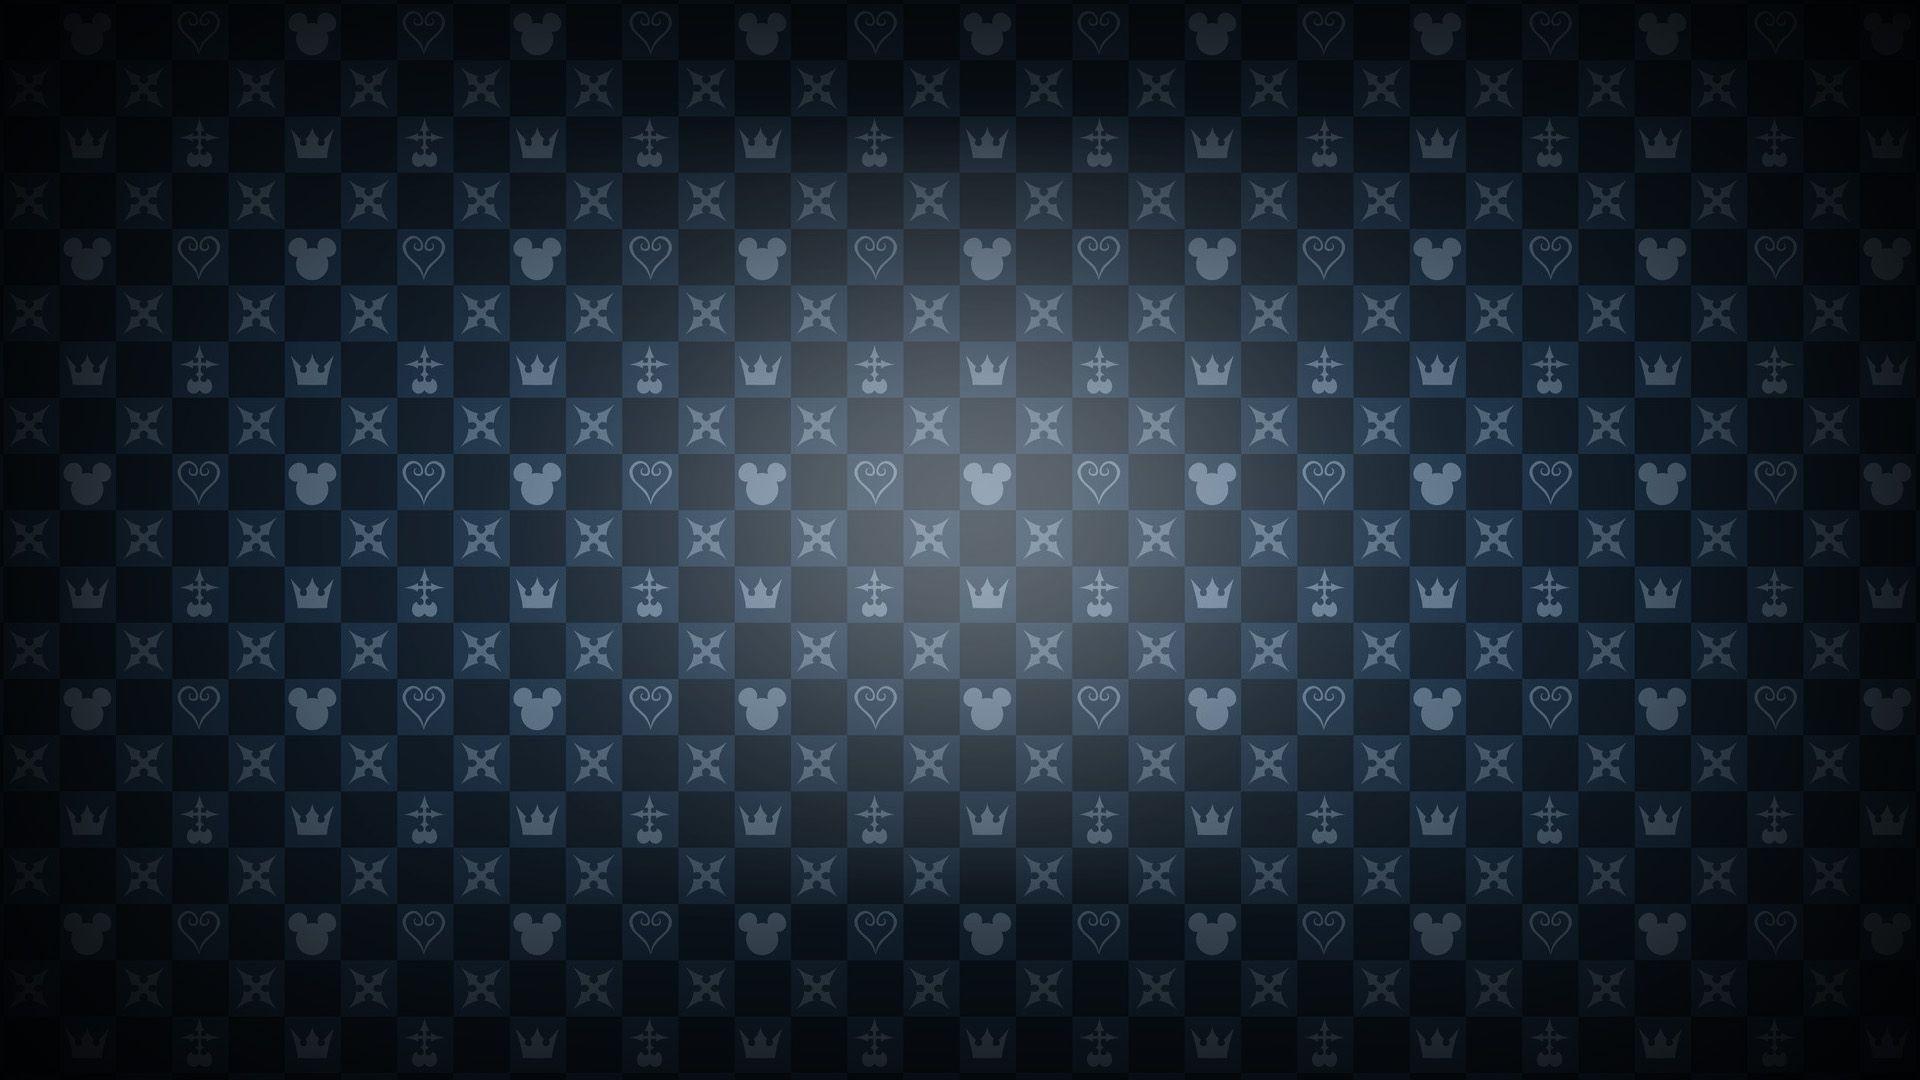 Kingdom Hearts pattern wallpaper #14547